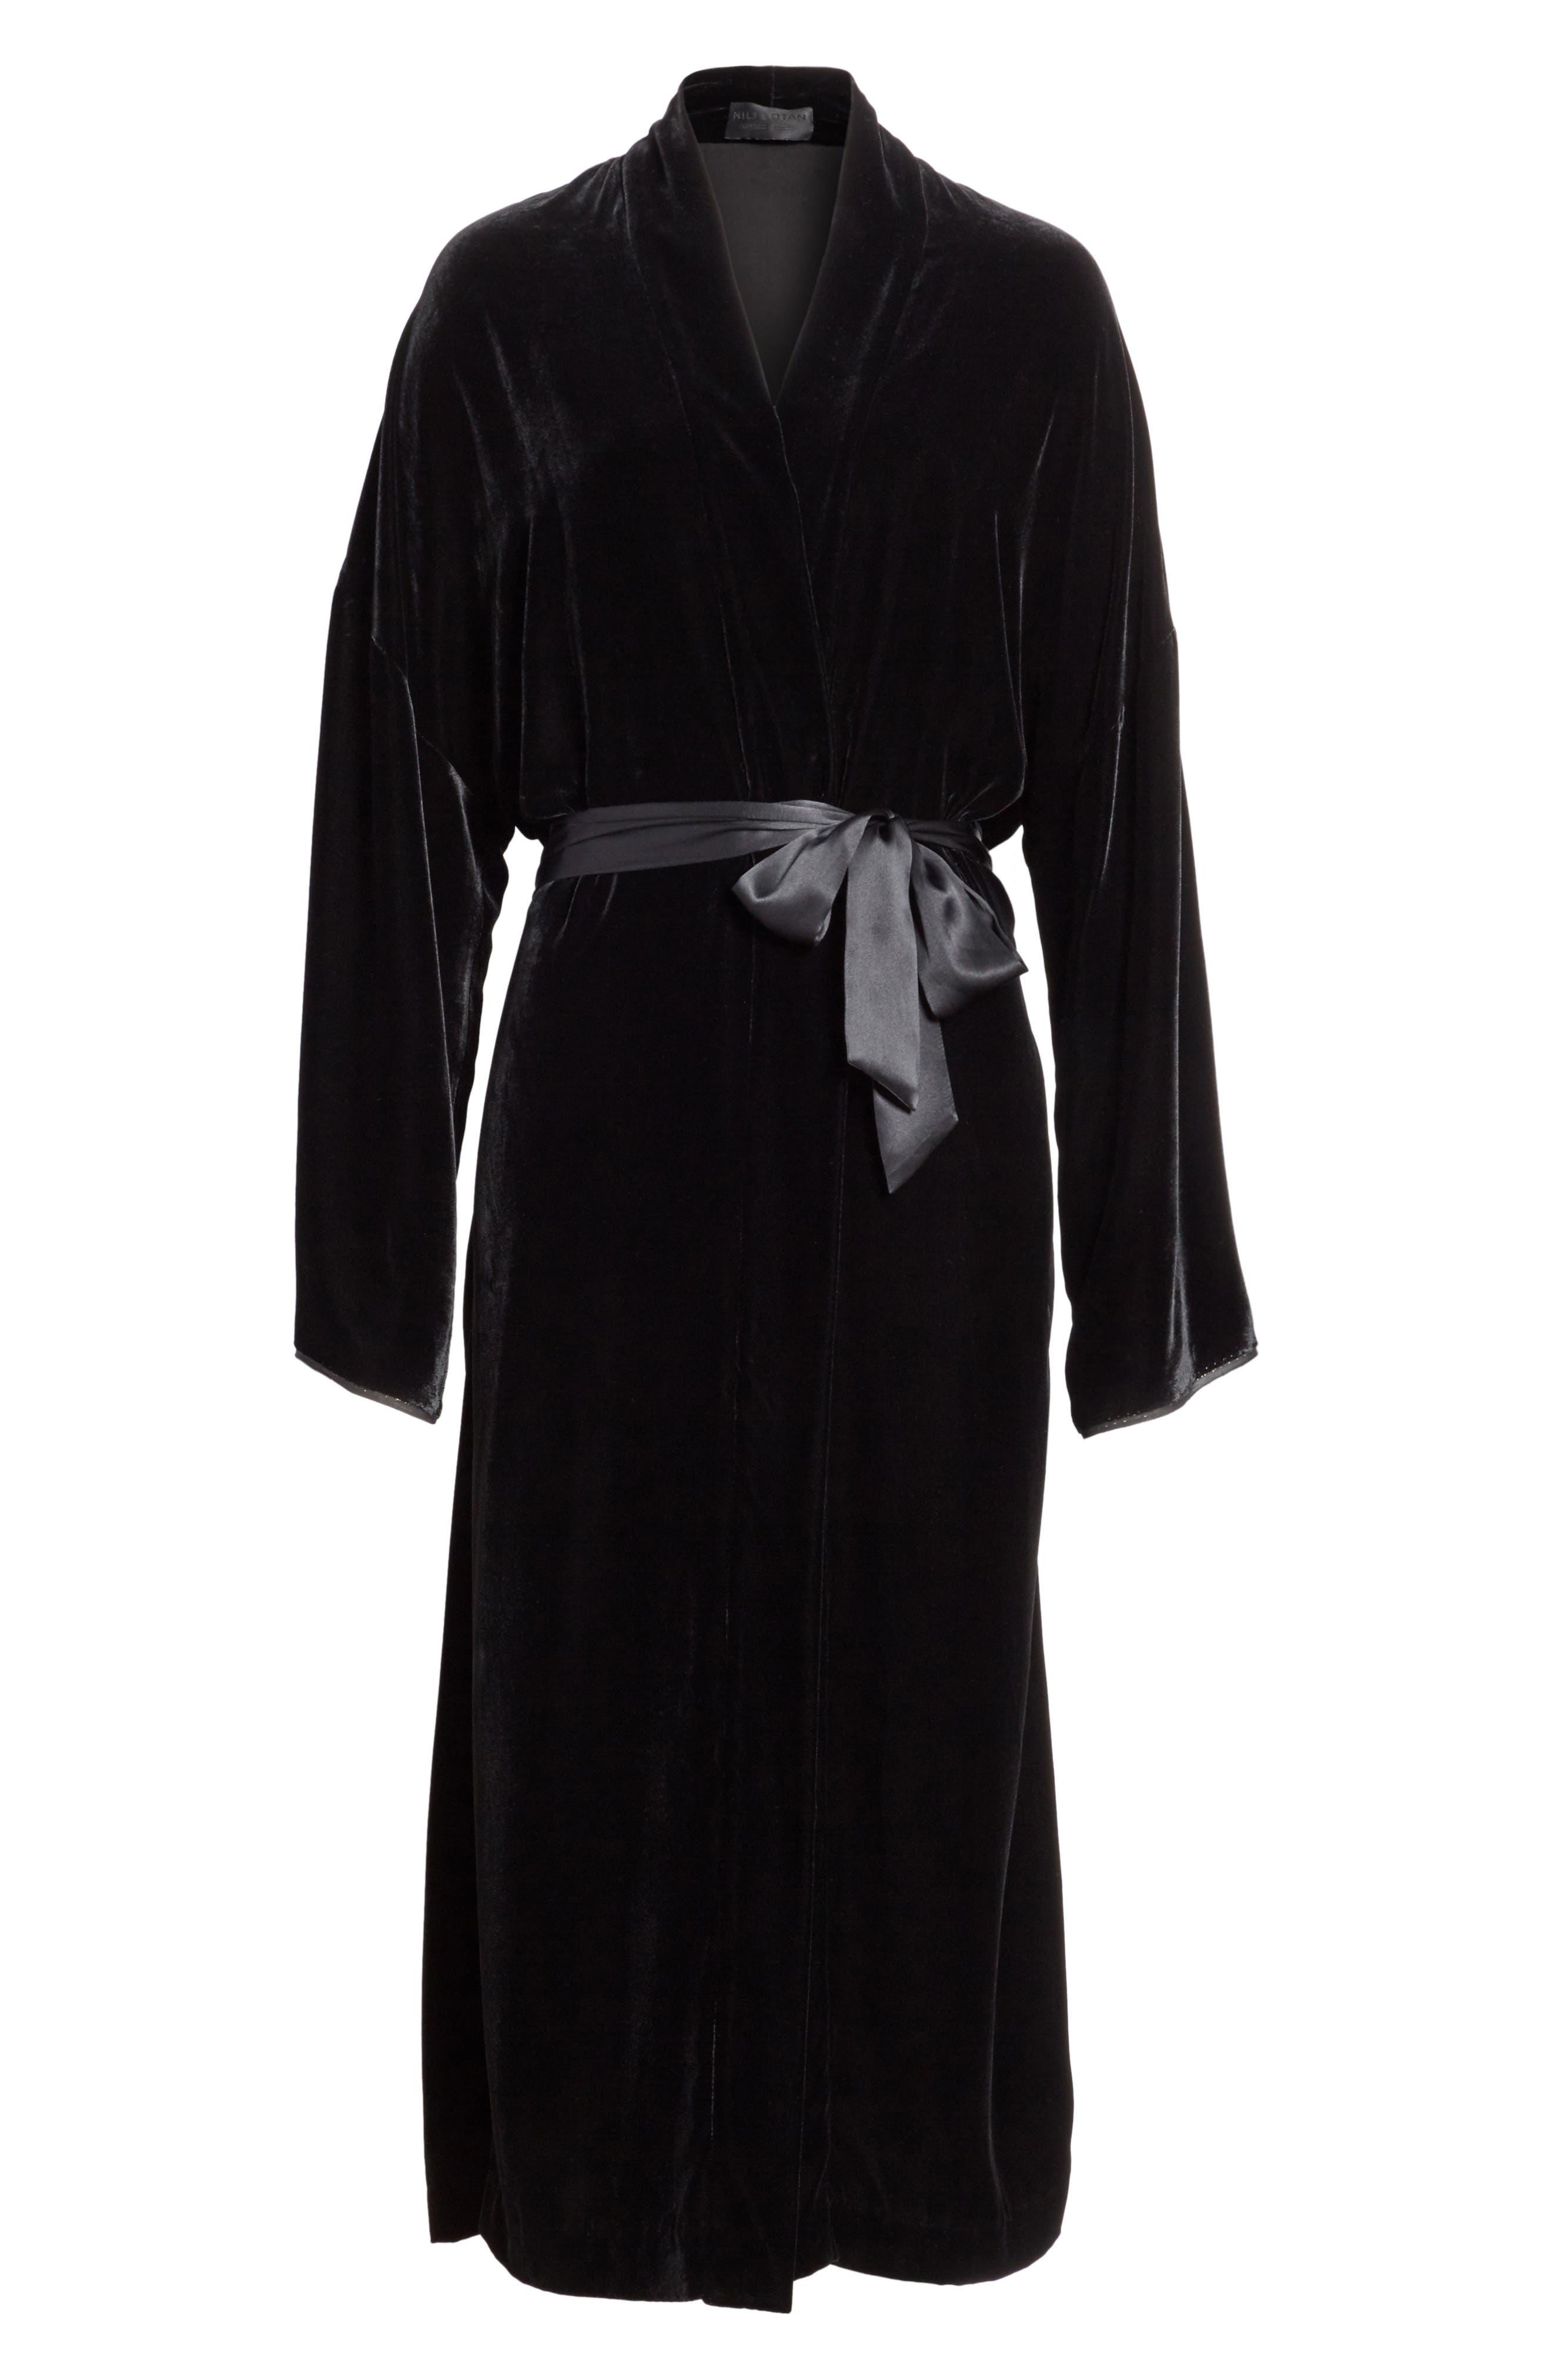 Muna Velvet Kimono,                             Alternate thumbnail 7, color,                             Black